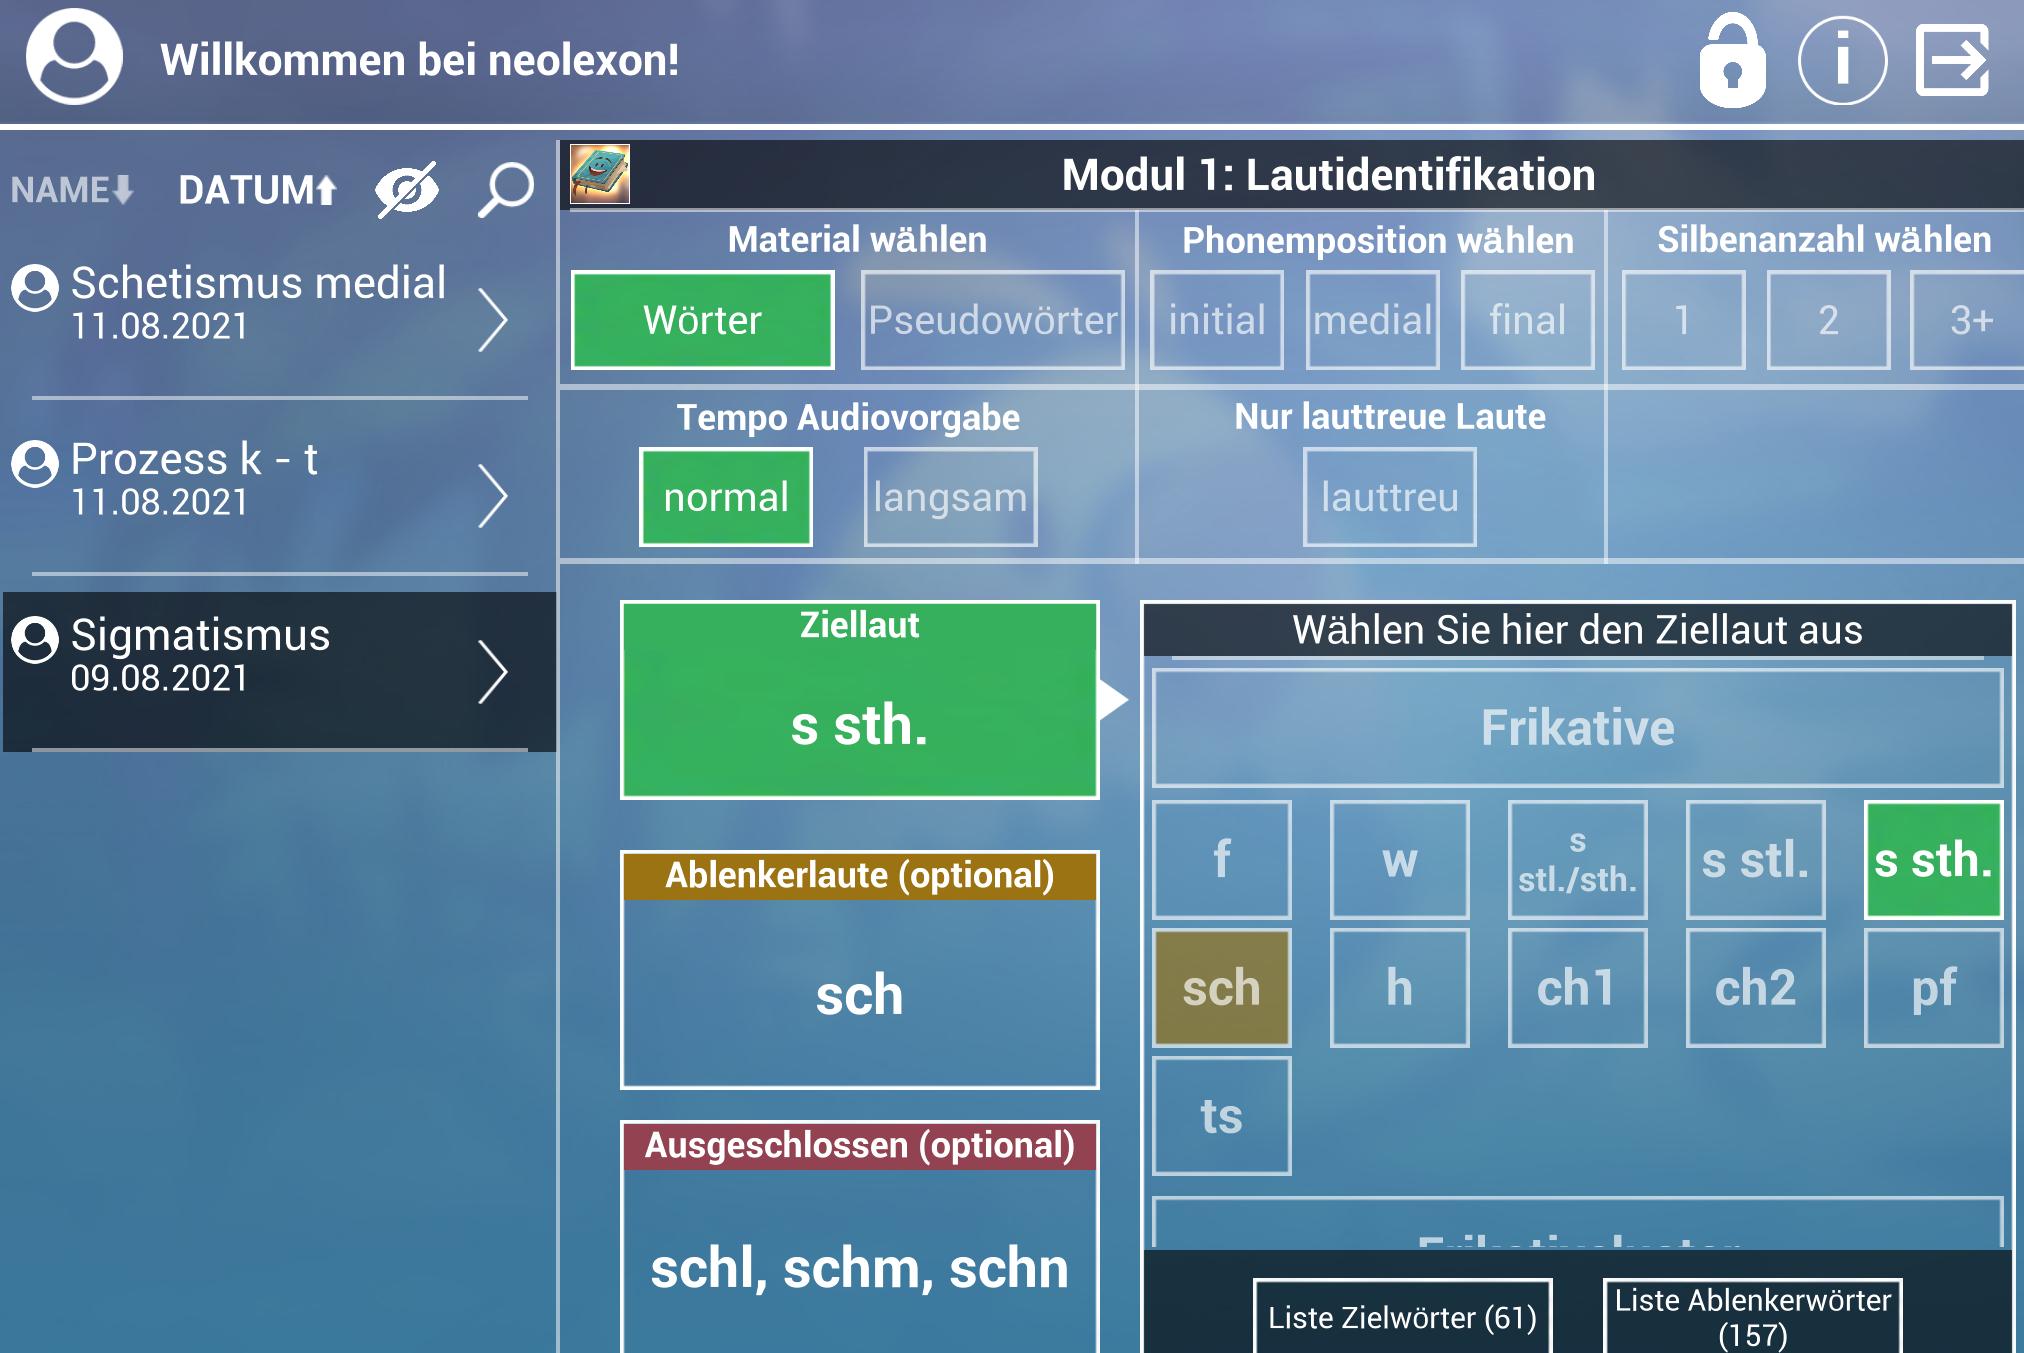 neolexon Artikulations-App Laute einstellen